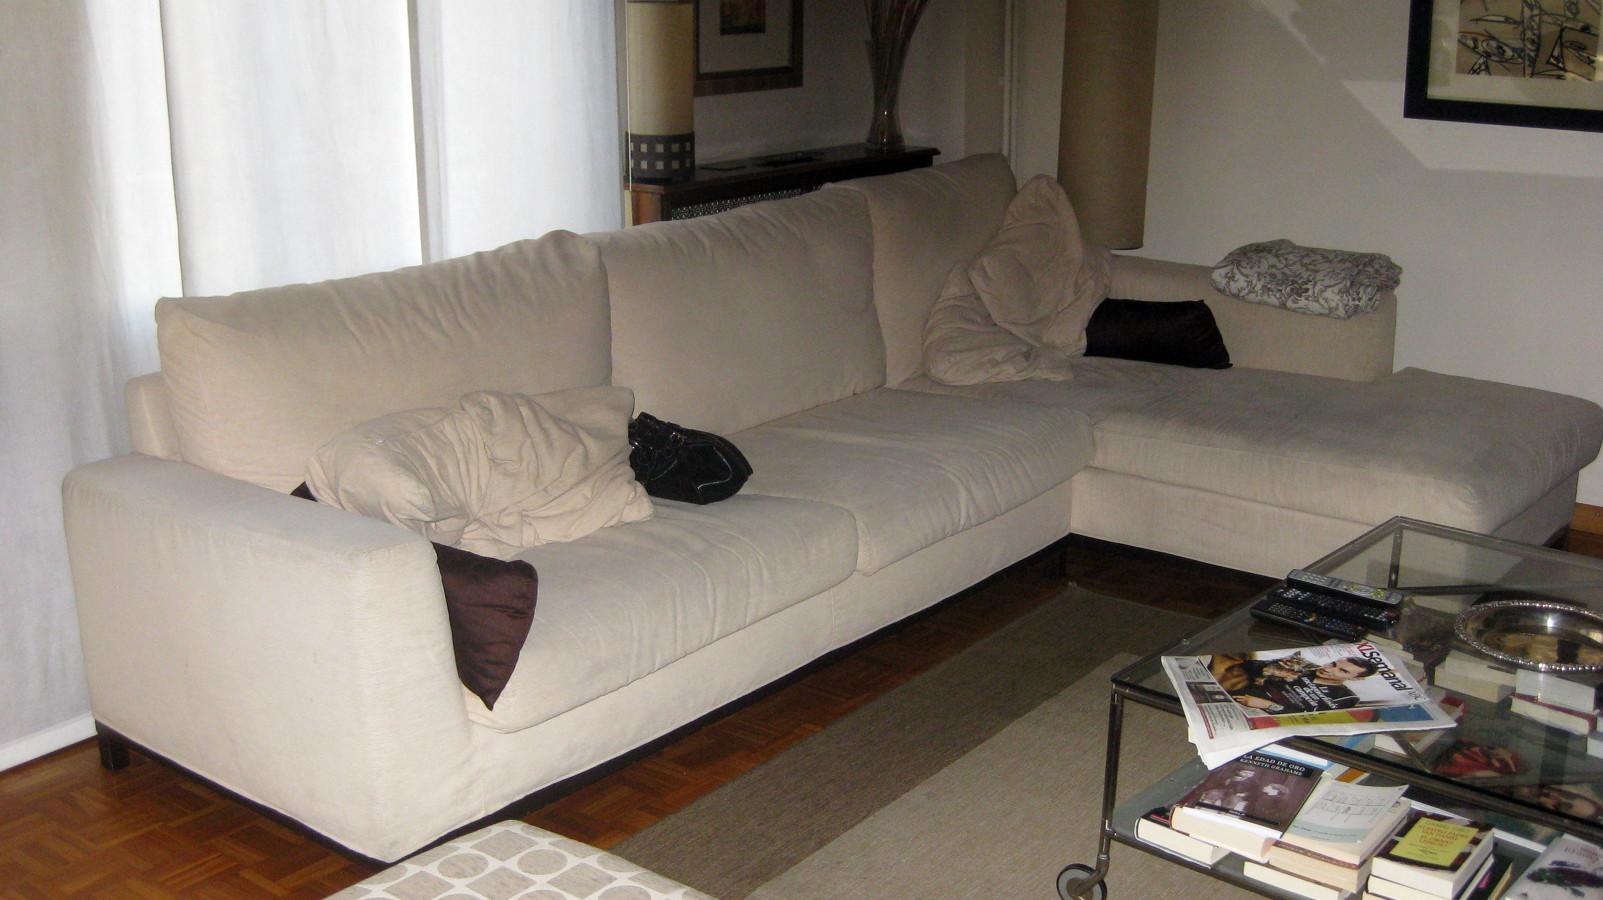 Tapizado sof barcelona barcelona habitissimo - Tapizar sofa barcelona ...